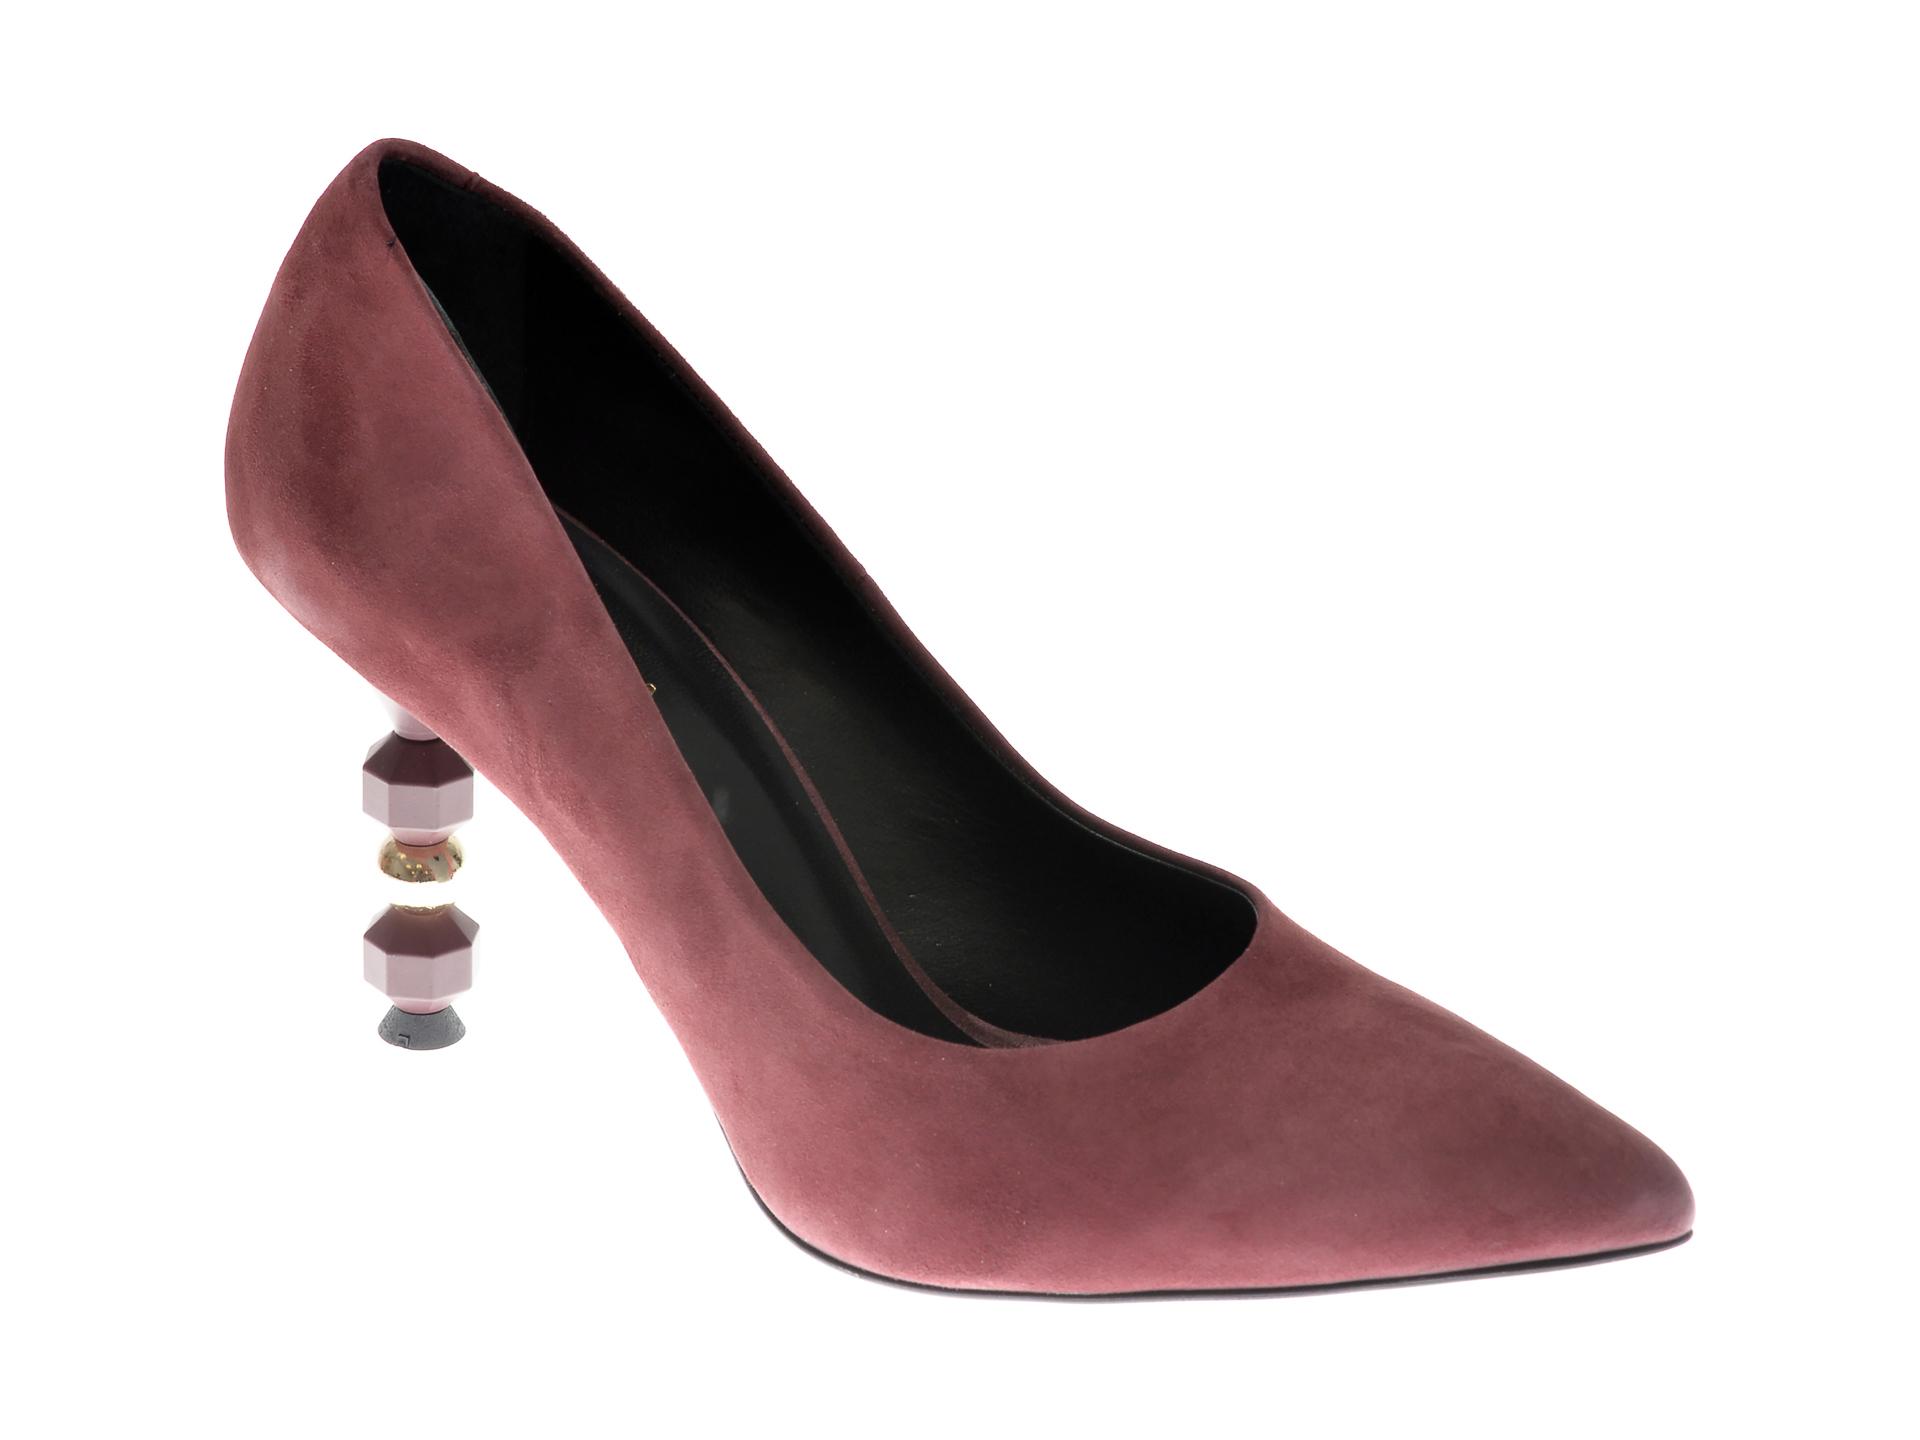 Pantofi EPICA visinii, 4217, din piele intoarsa imagine otter.ro